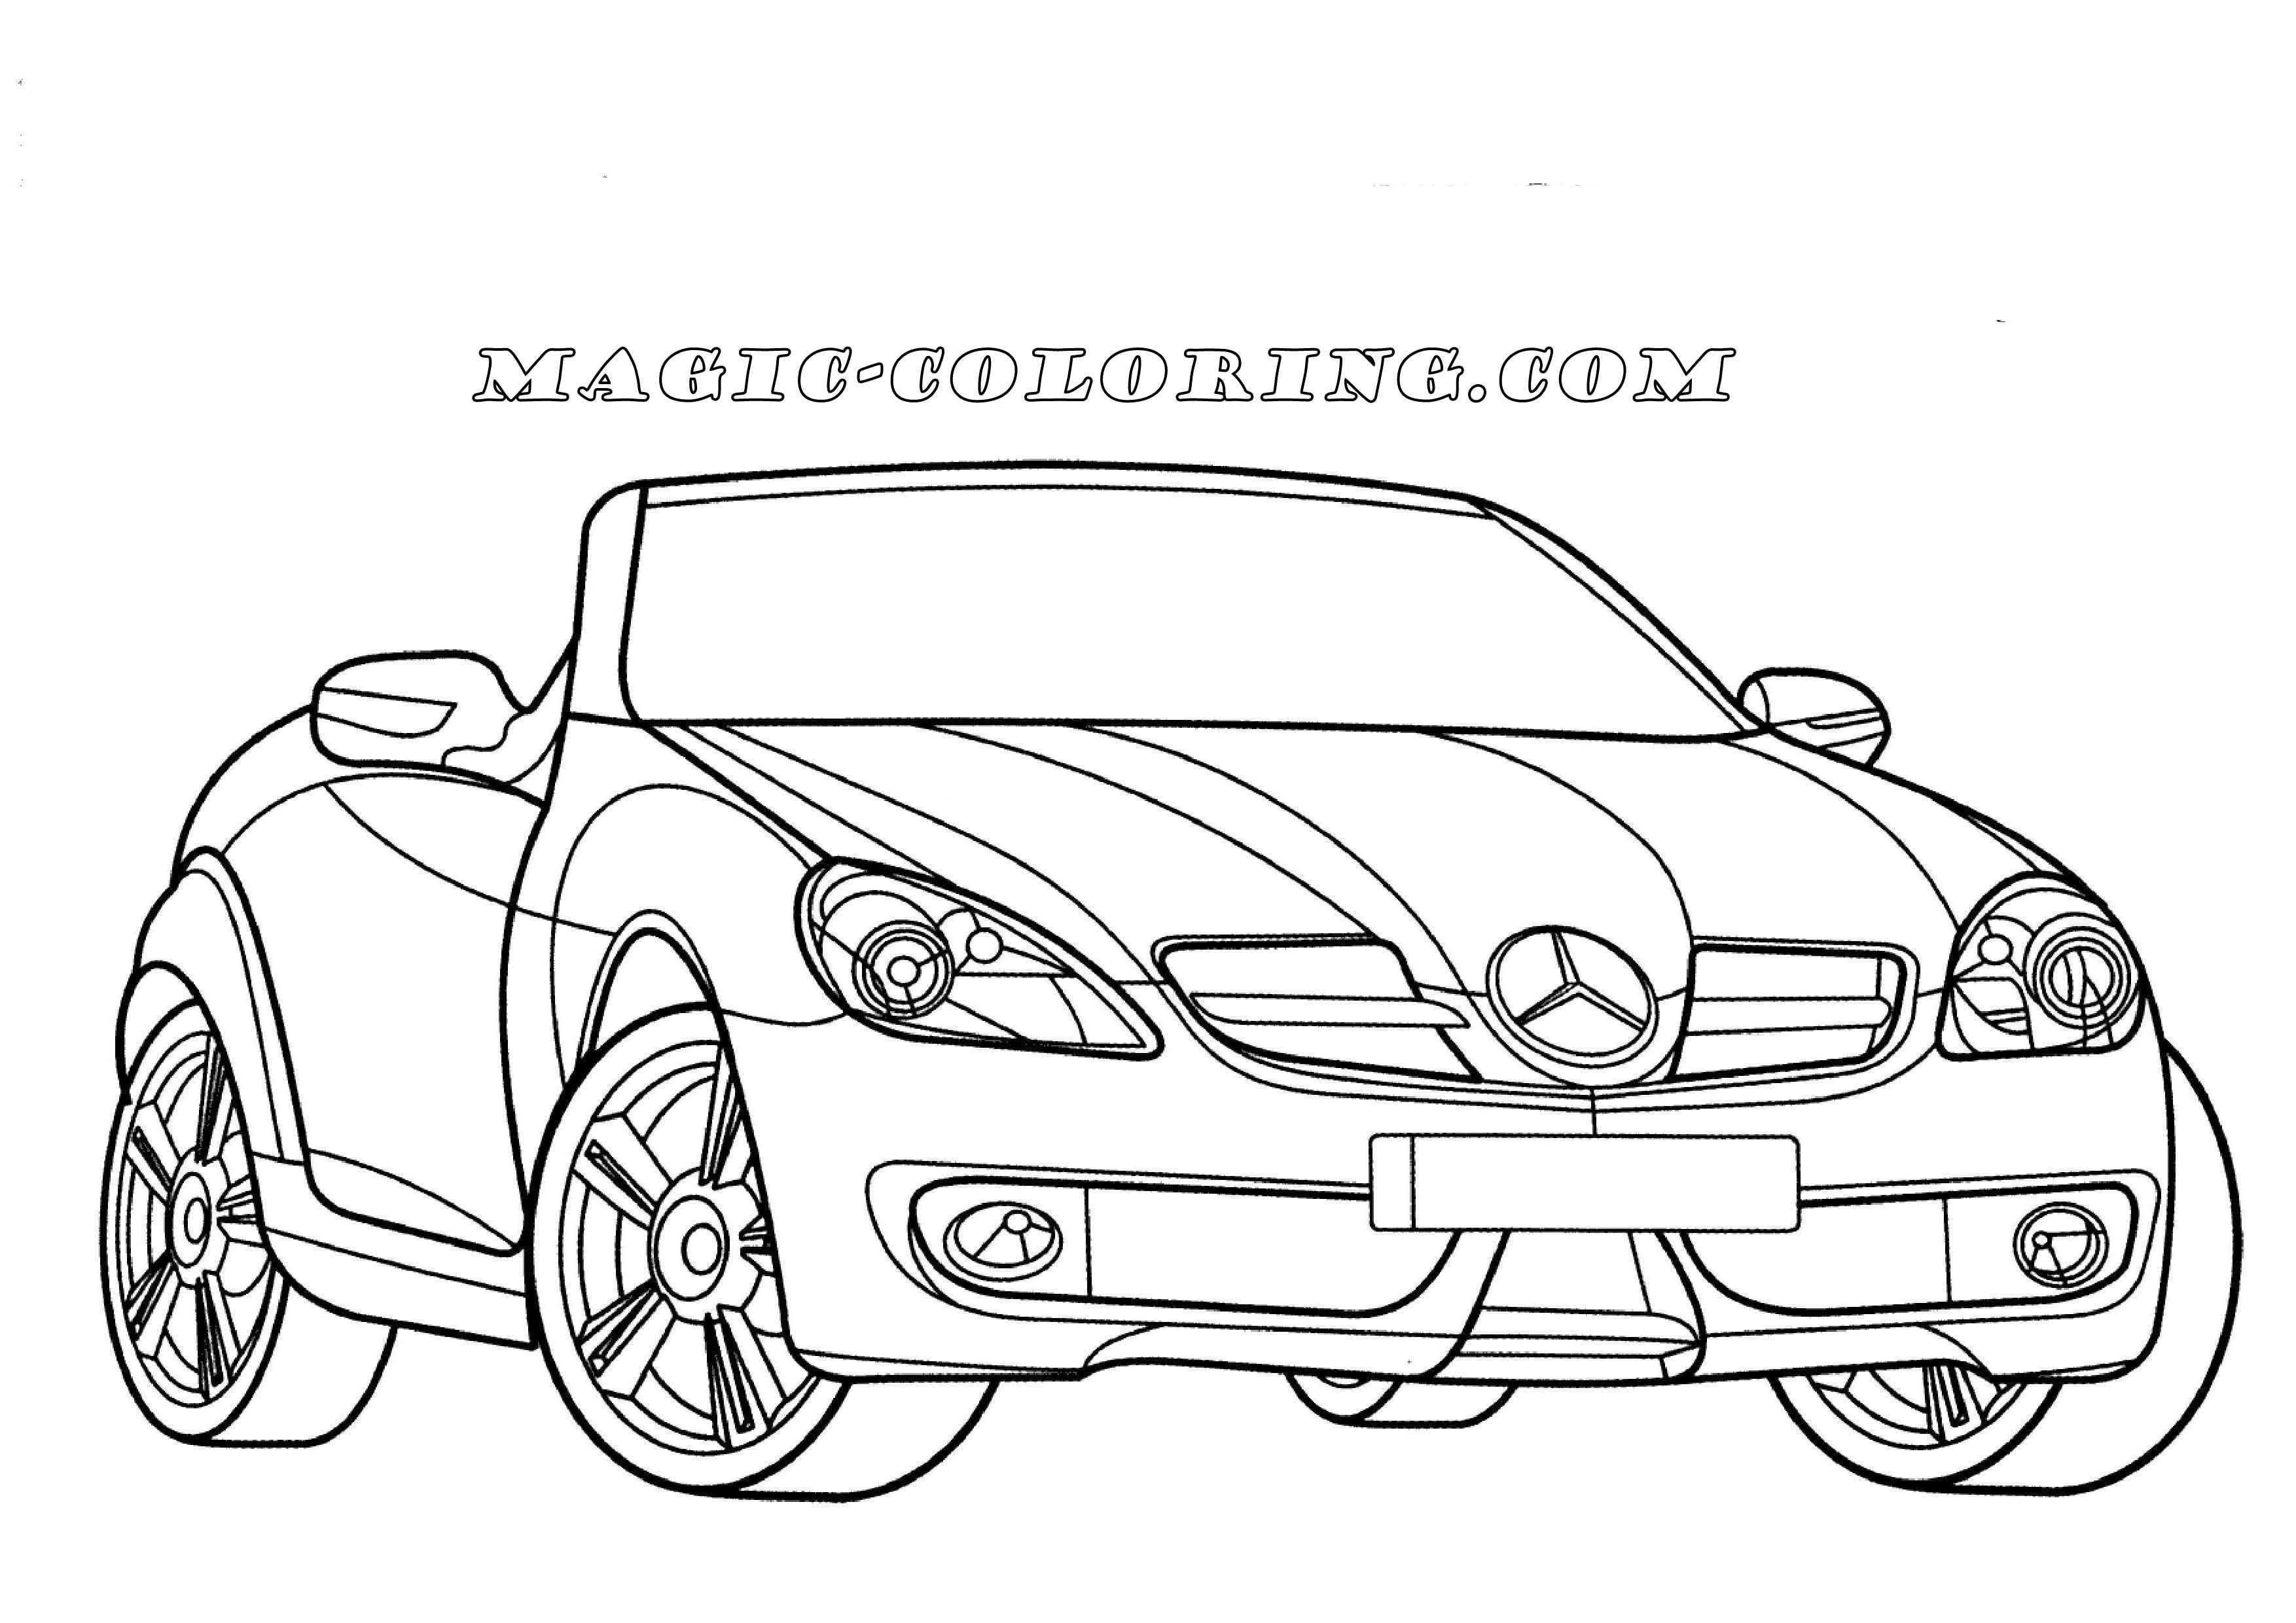 Transportation Coloring Pages With Images Mercedes Benz Slk